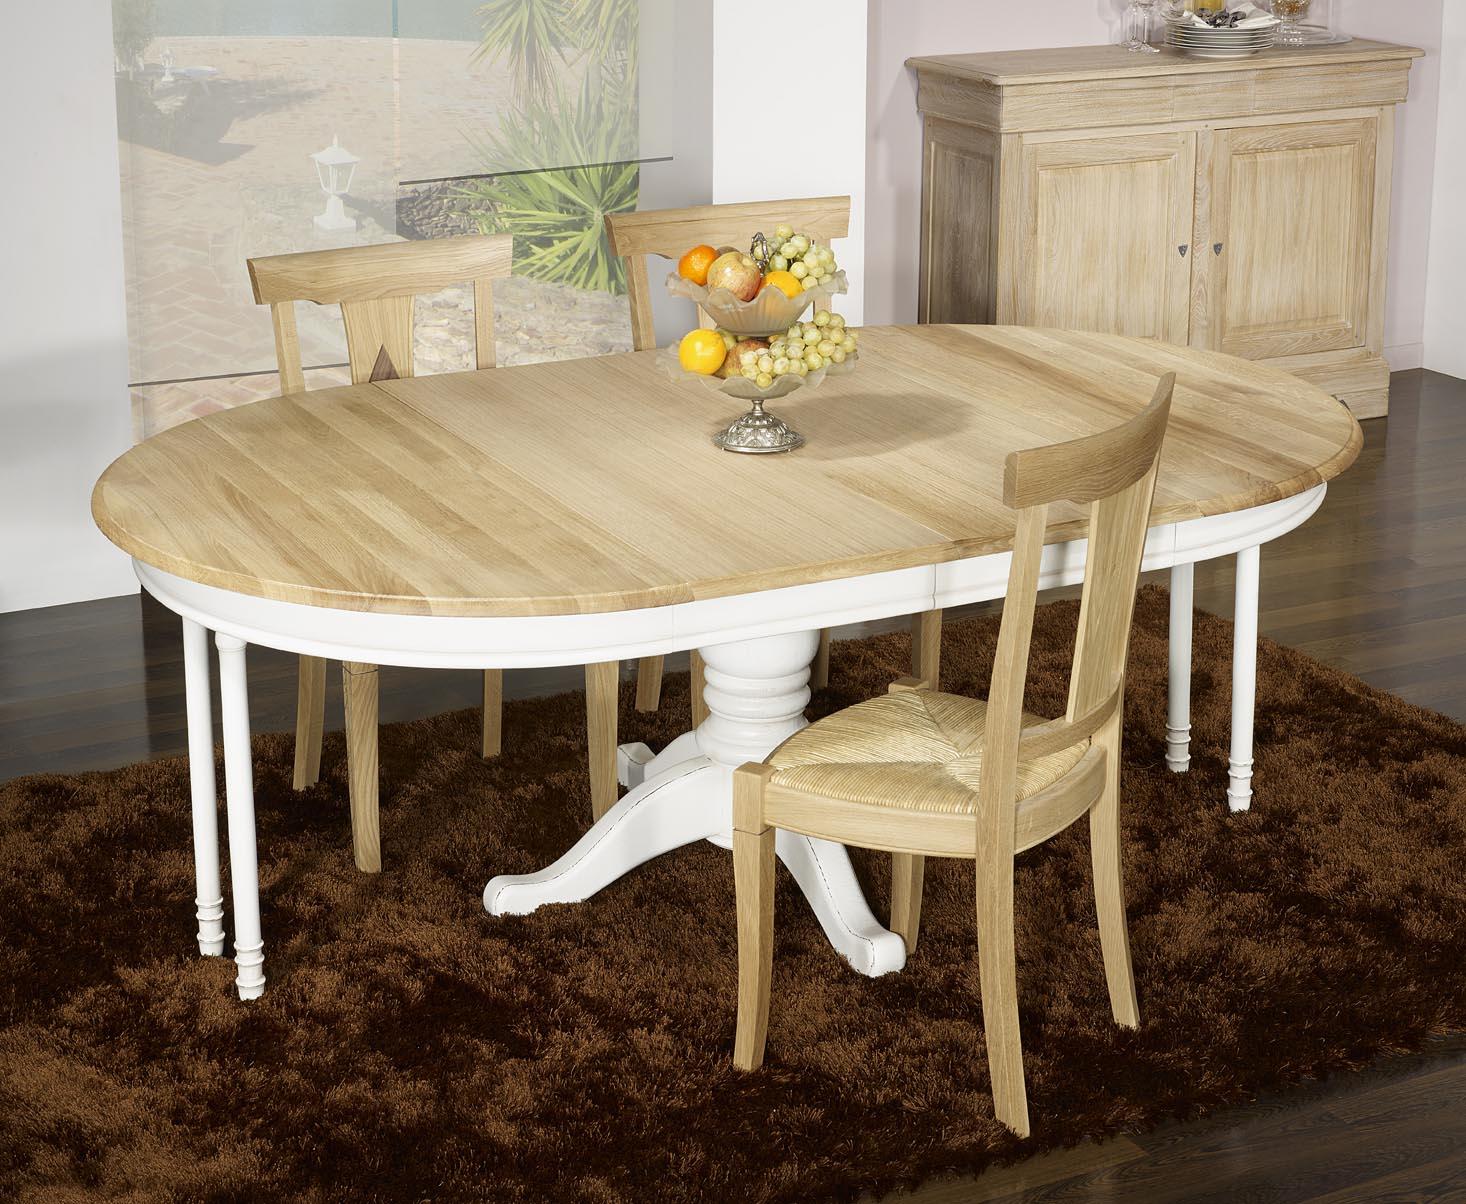 table ronde pied central en ch ne massif de style louis. Black Bedroom Furniture Sets. Home Design Ideas